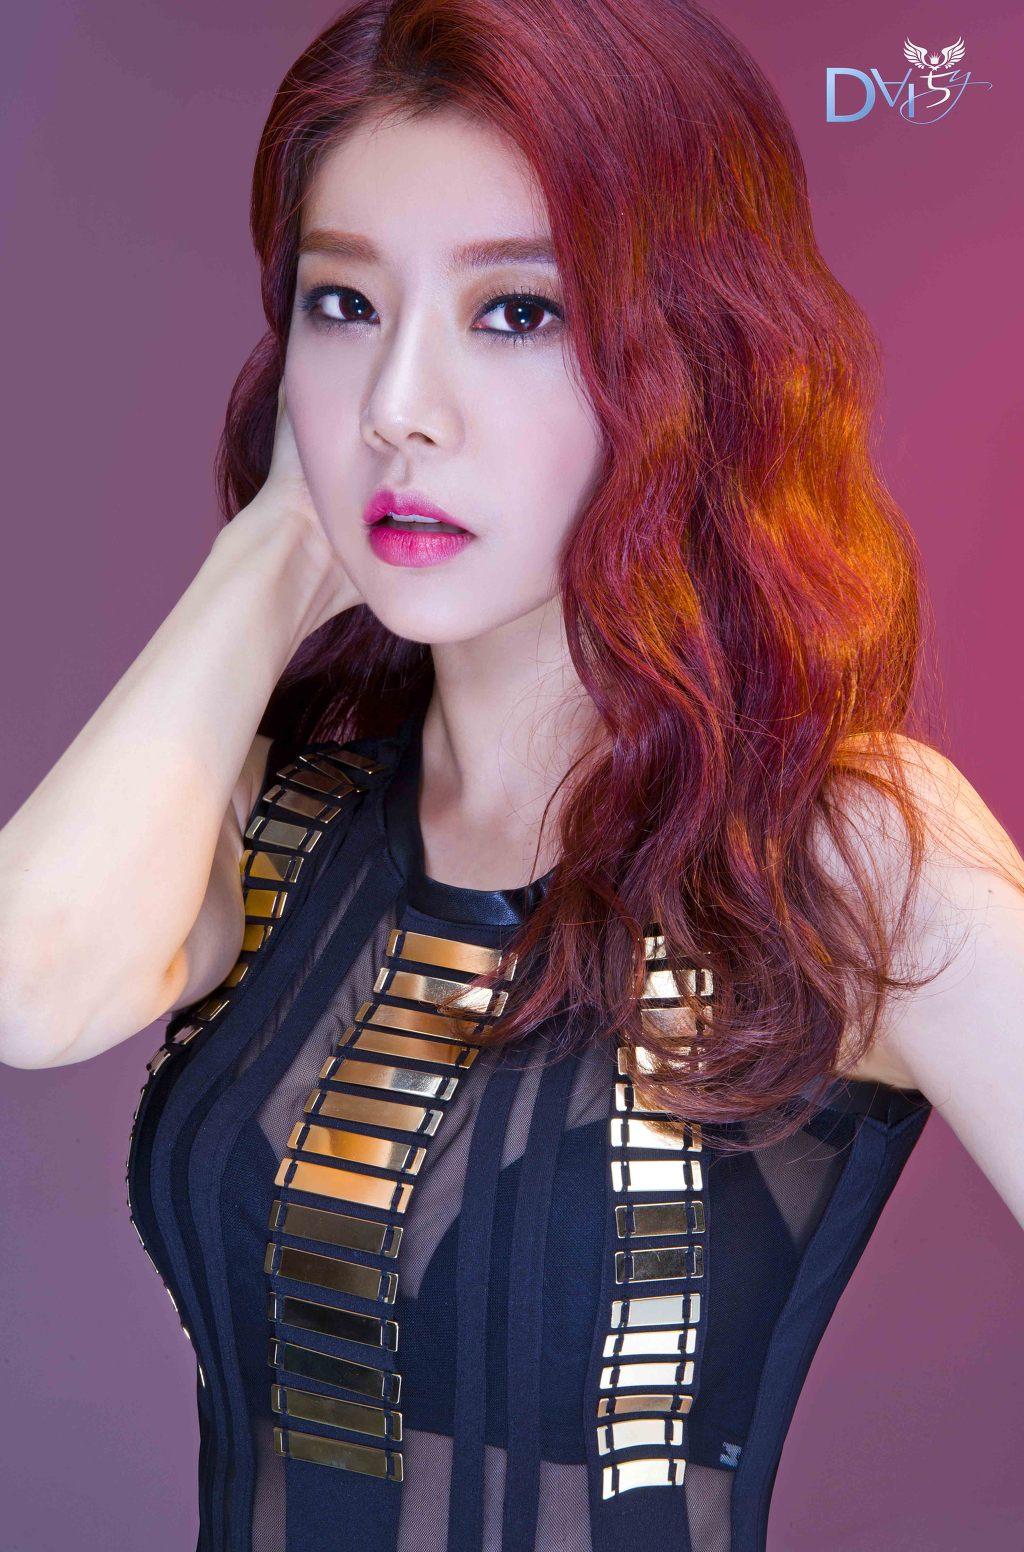 [PICS] 130331 Girls Day Hyeri - Fansigning Event - Girls